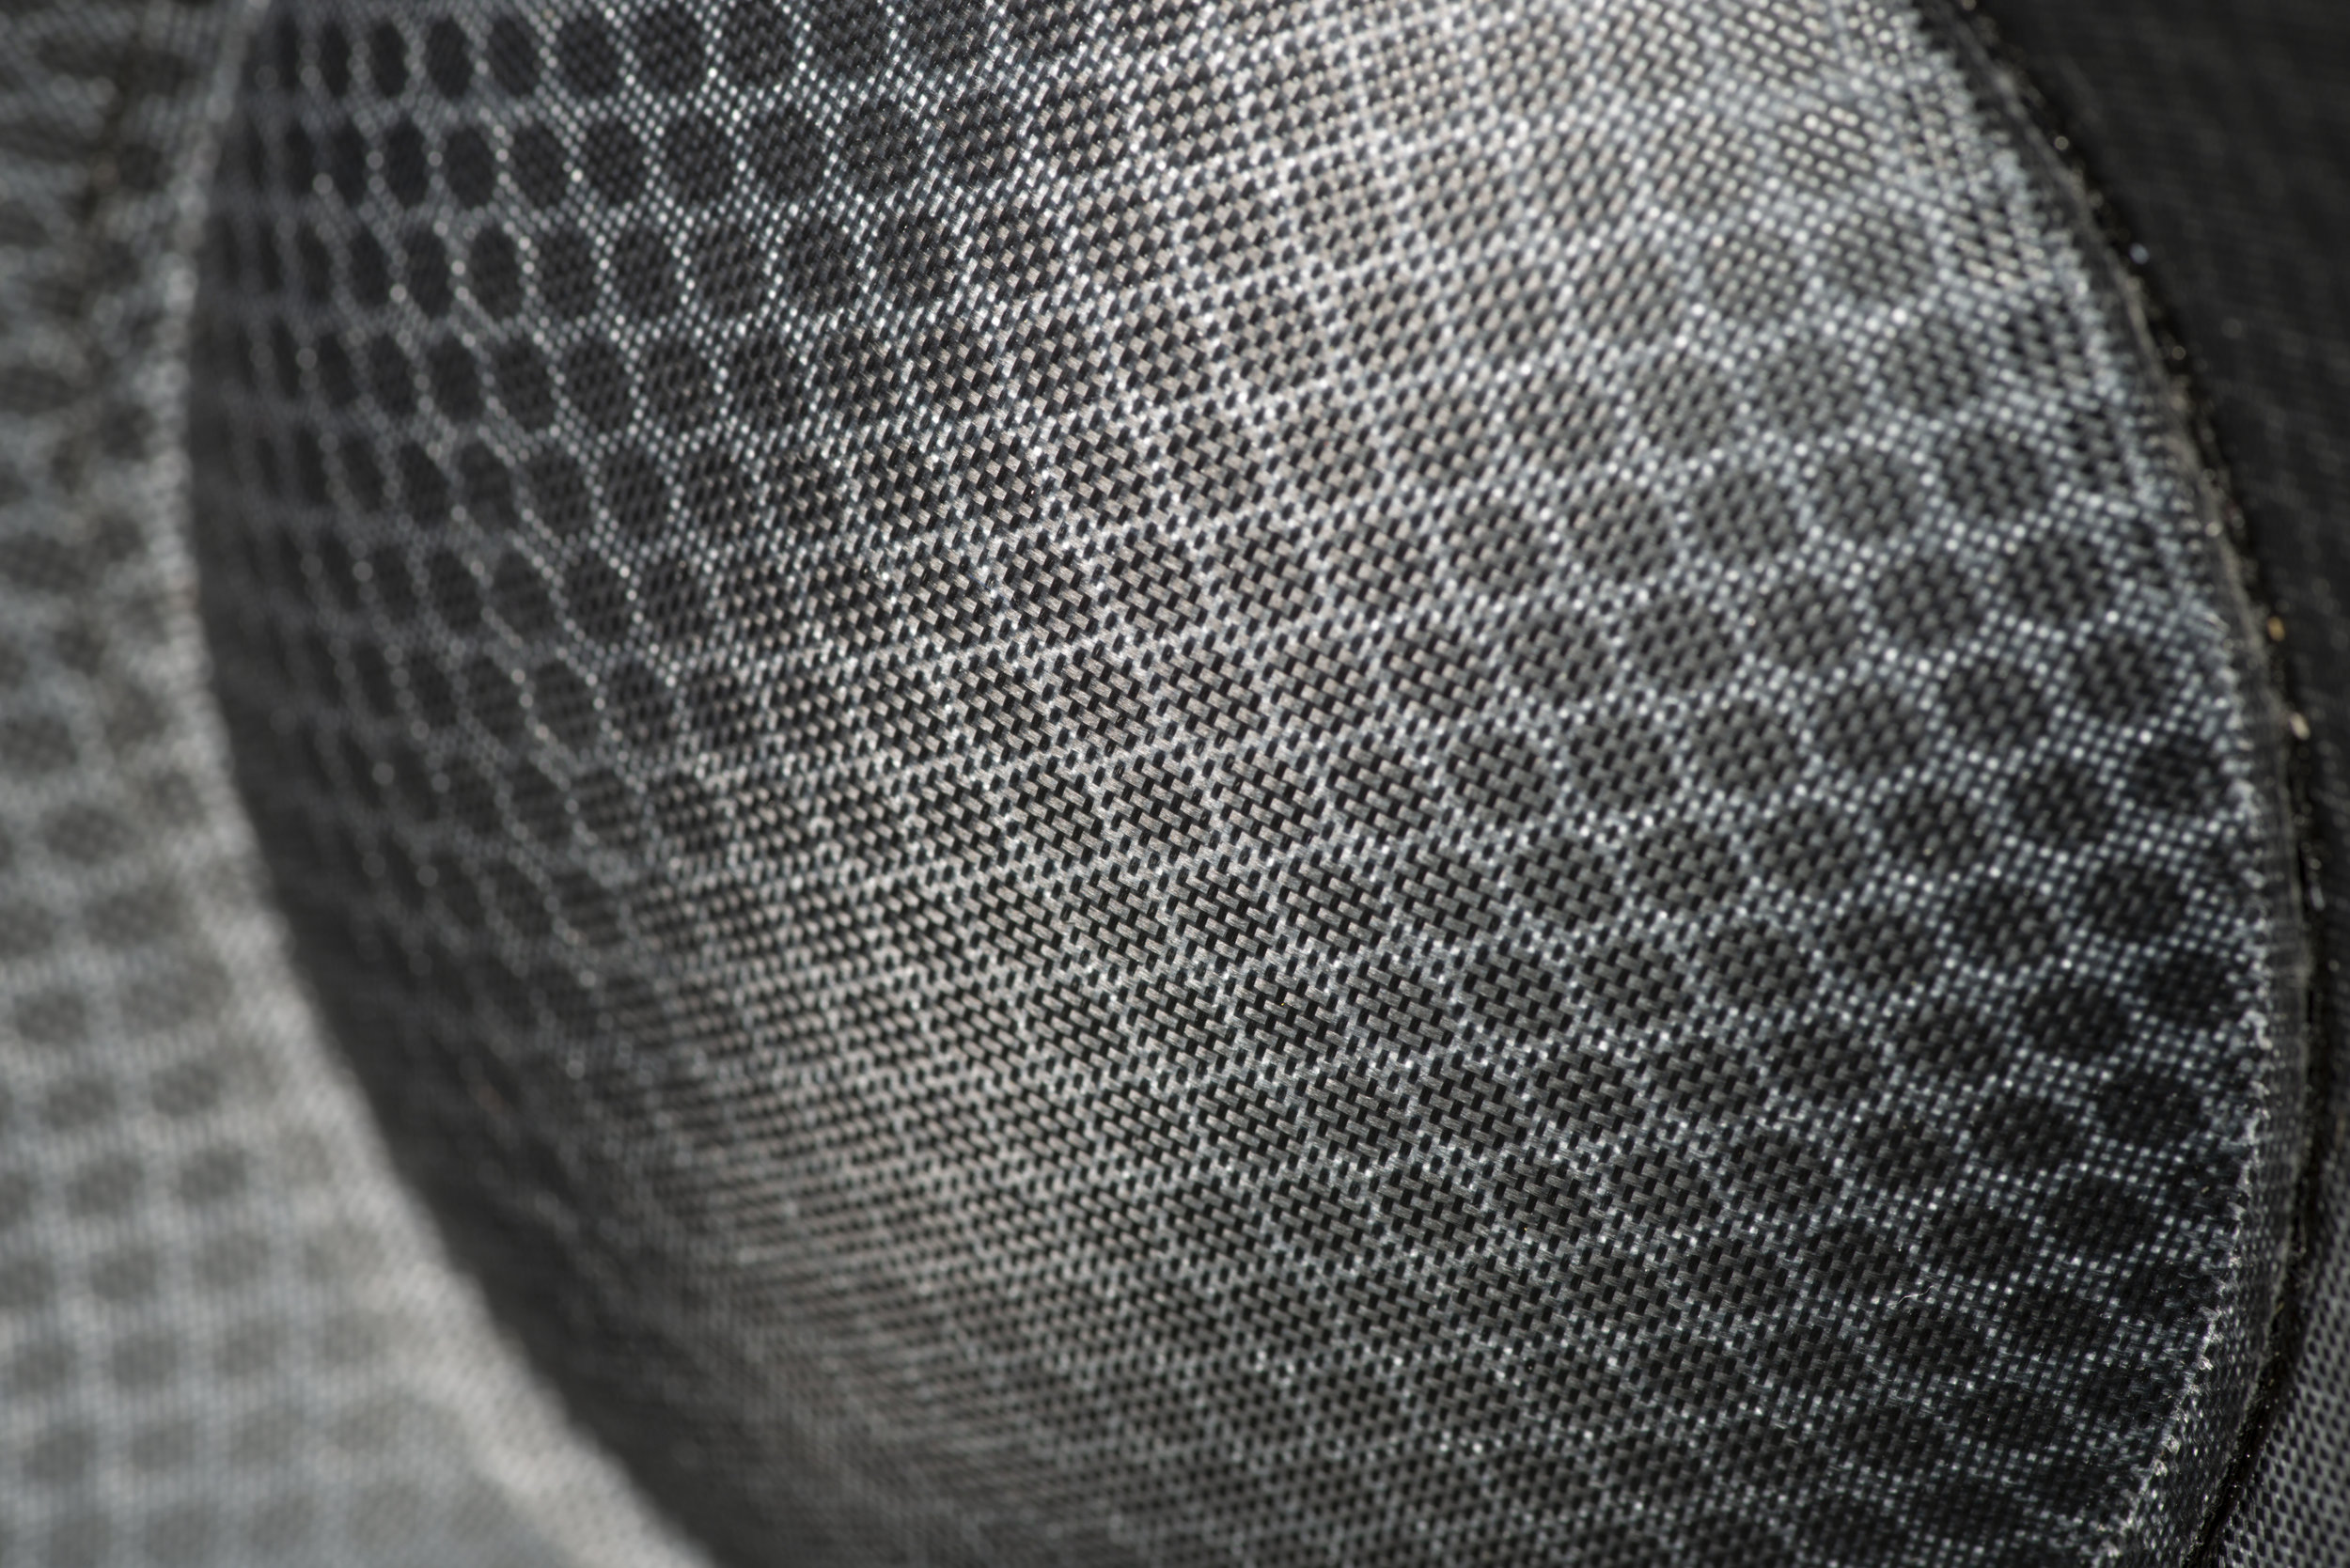 HRS-130 loudspeaker woofer | Audio-philia, Edinburgh, Scotland